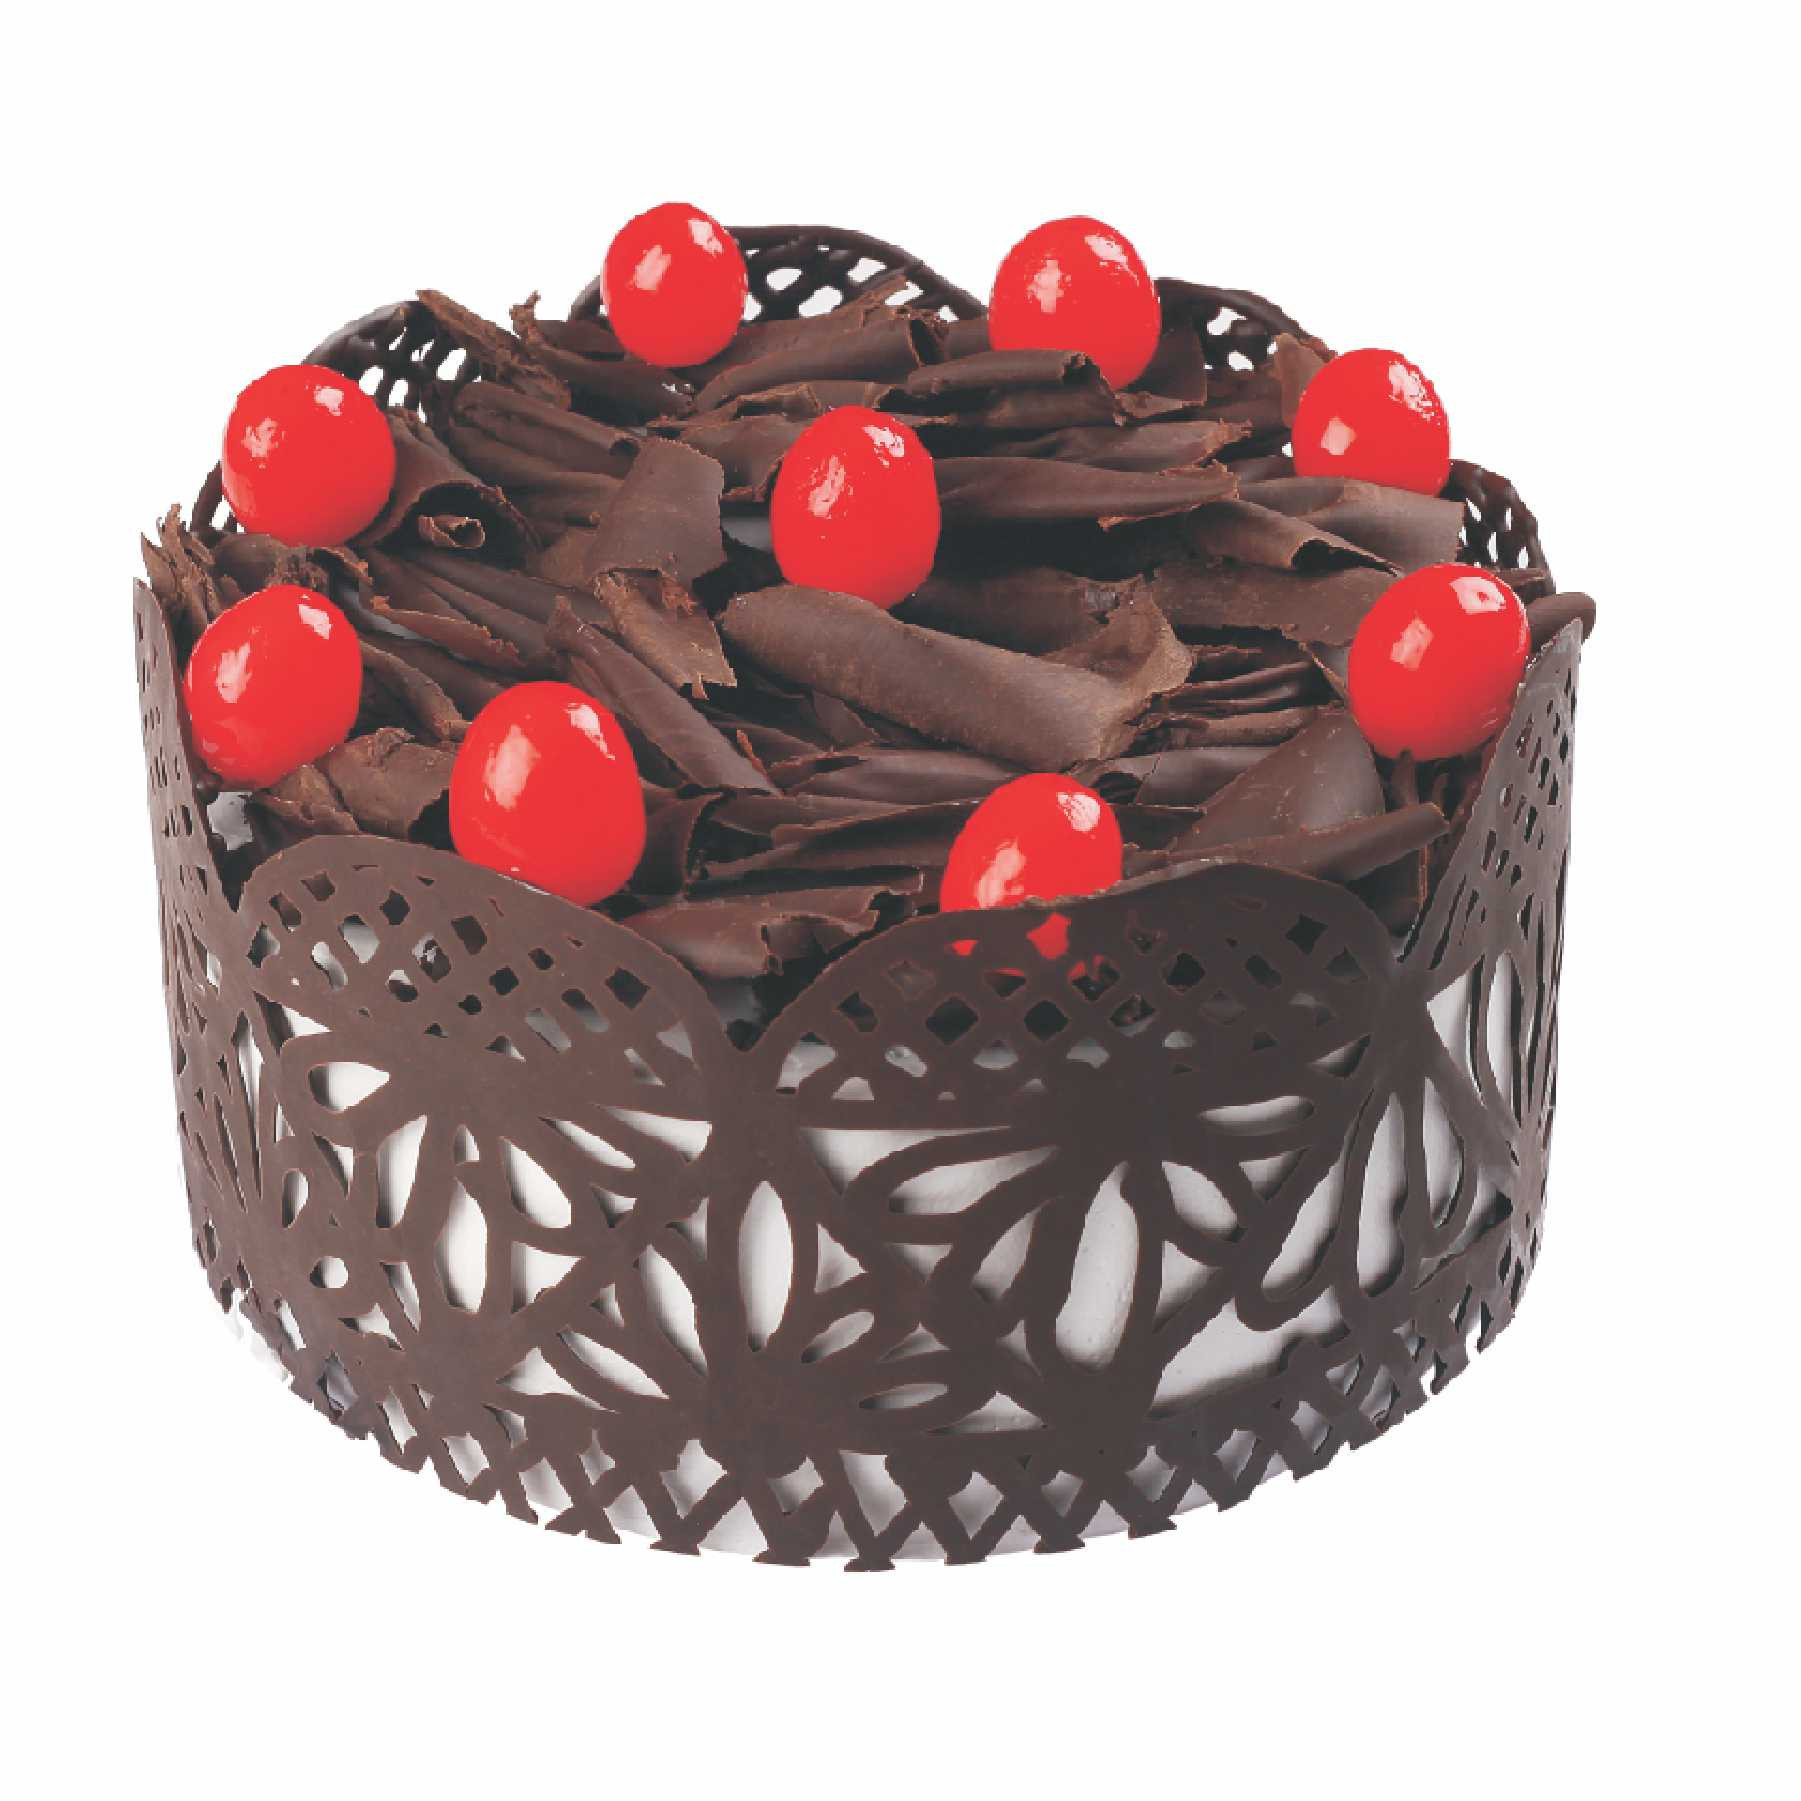 Birthday Cake Shops Near Me  Best Birthday Cake Shop Chocolate Cake Shop